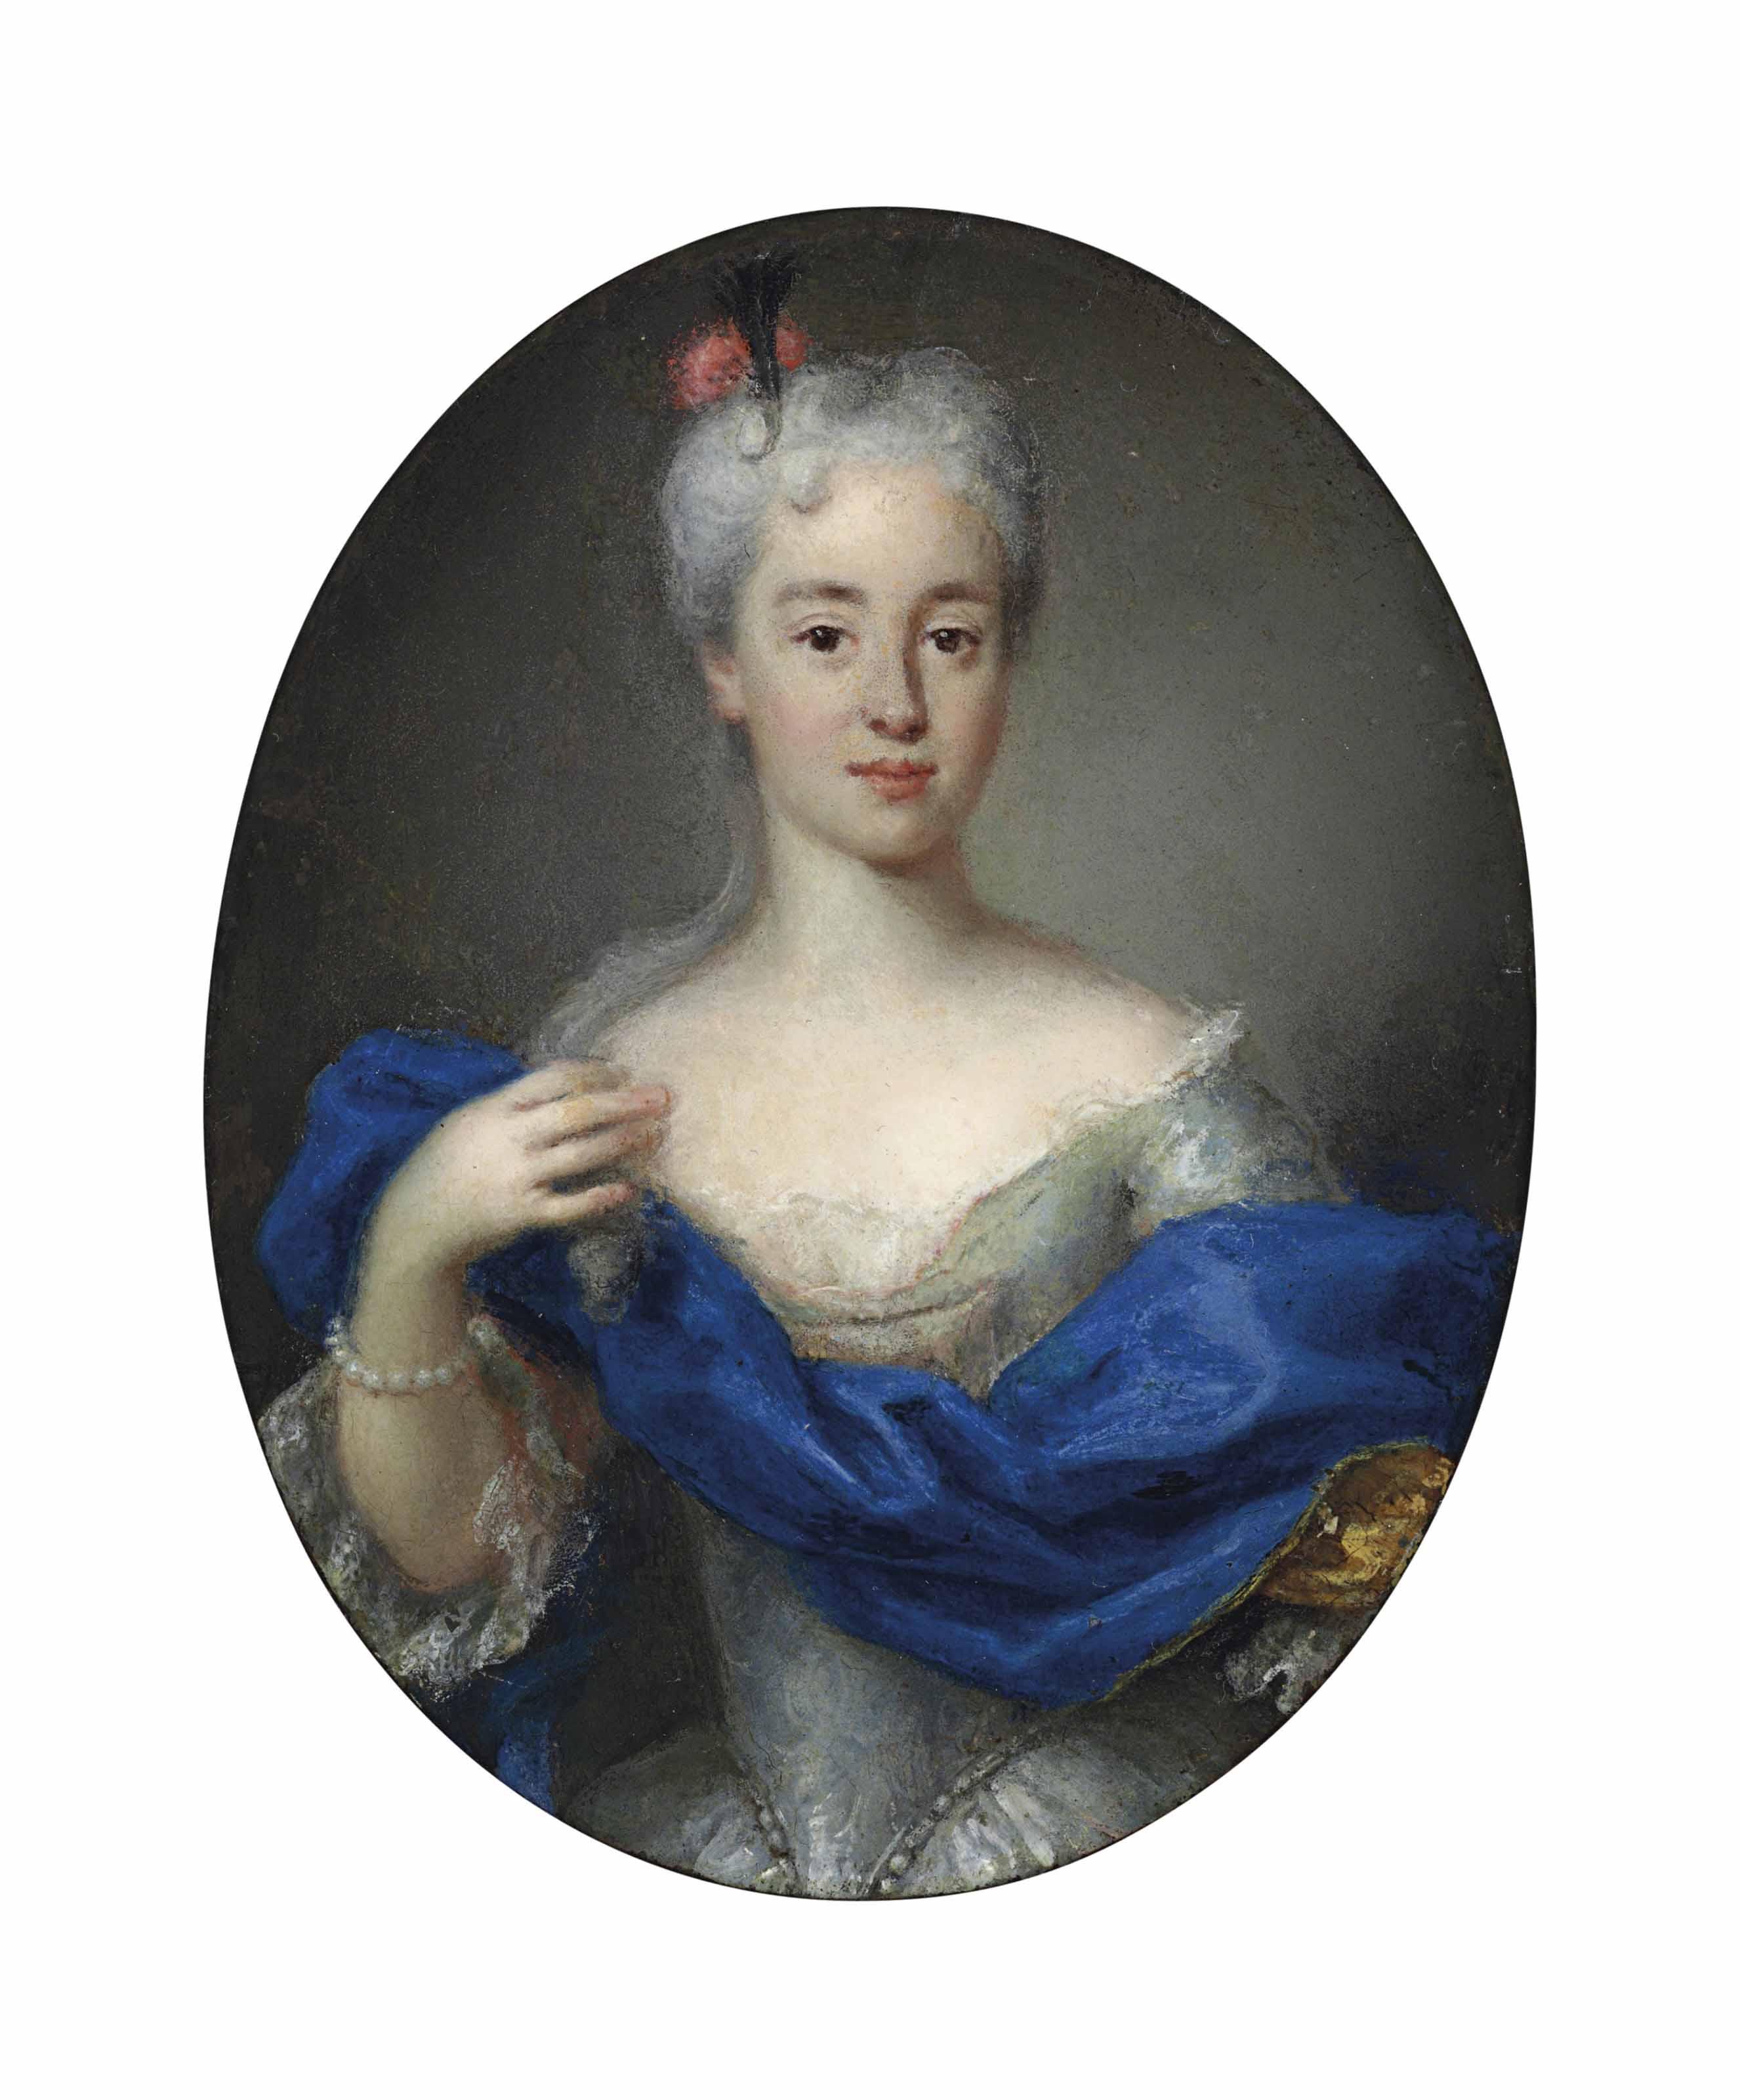 Portrait of Maria Clementina Sobieska (1702-1735), three-quarter-length, in a white dress and blue wrap